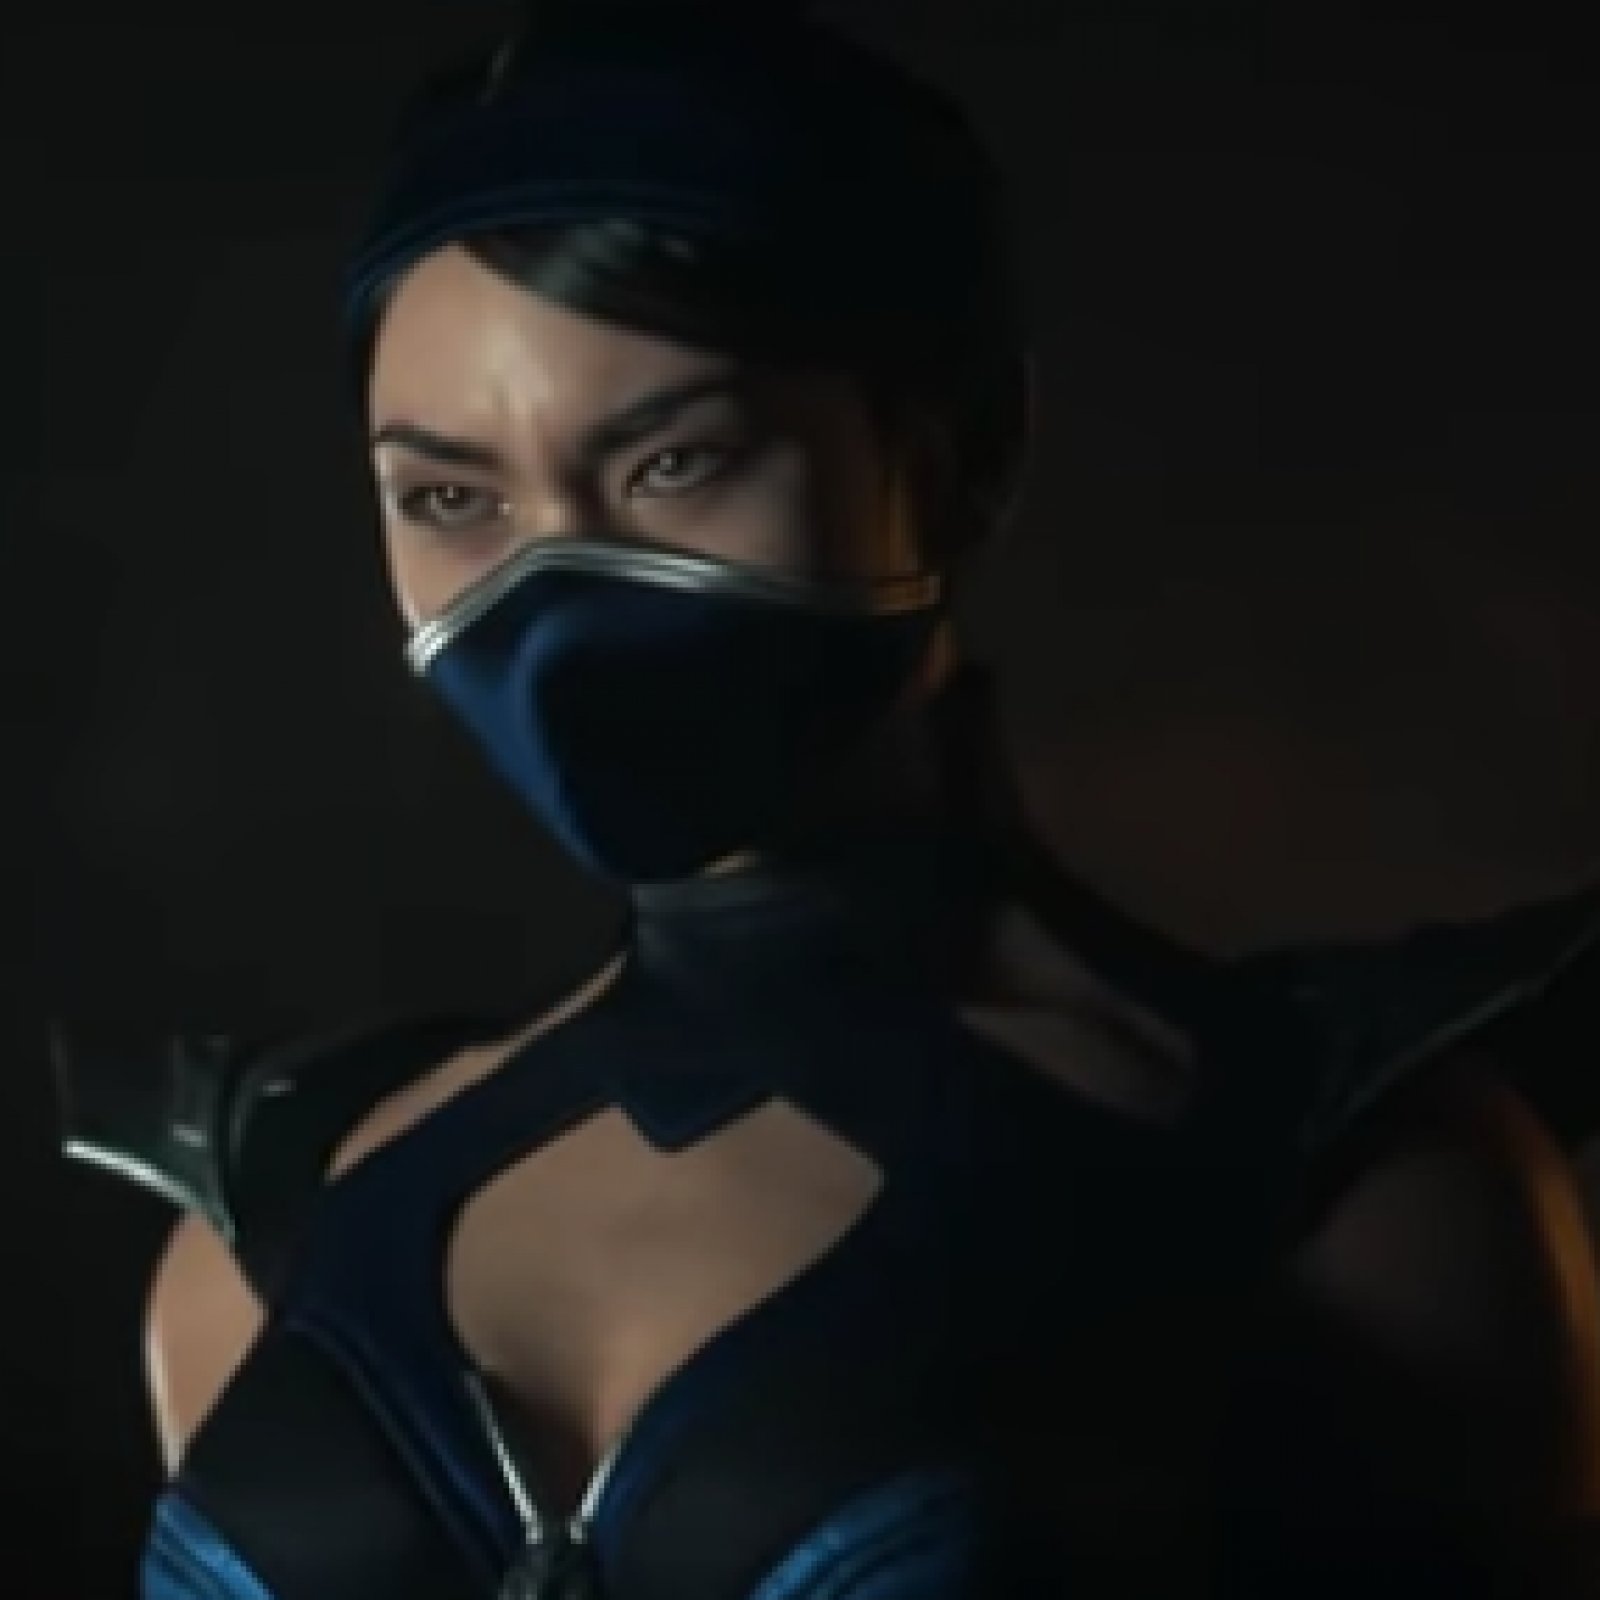 Kitana Confirmed For Mortal Kombat 11 Roster In New Tv Spot